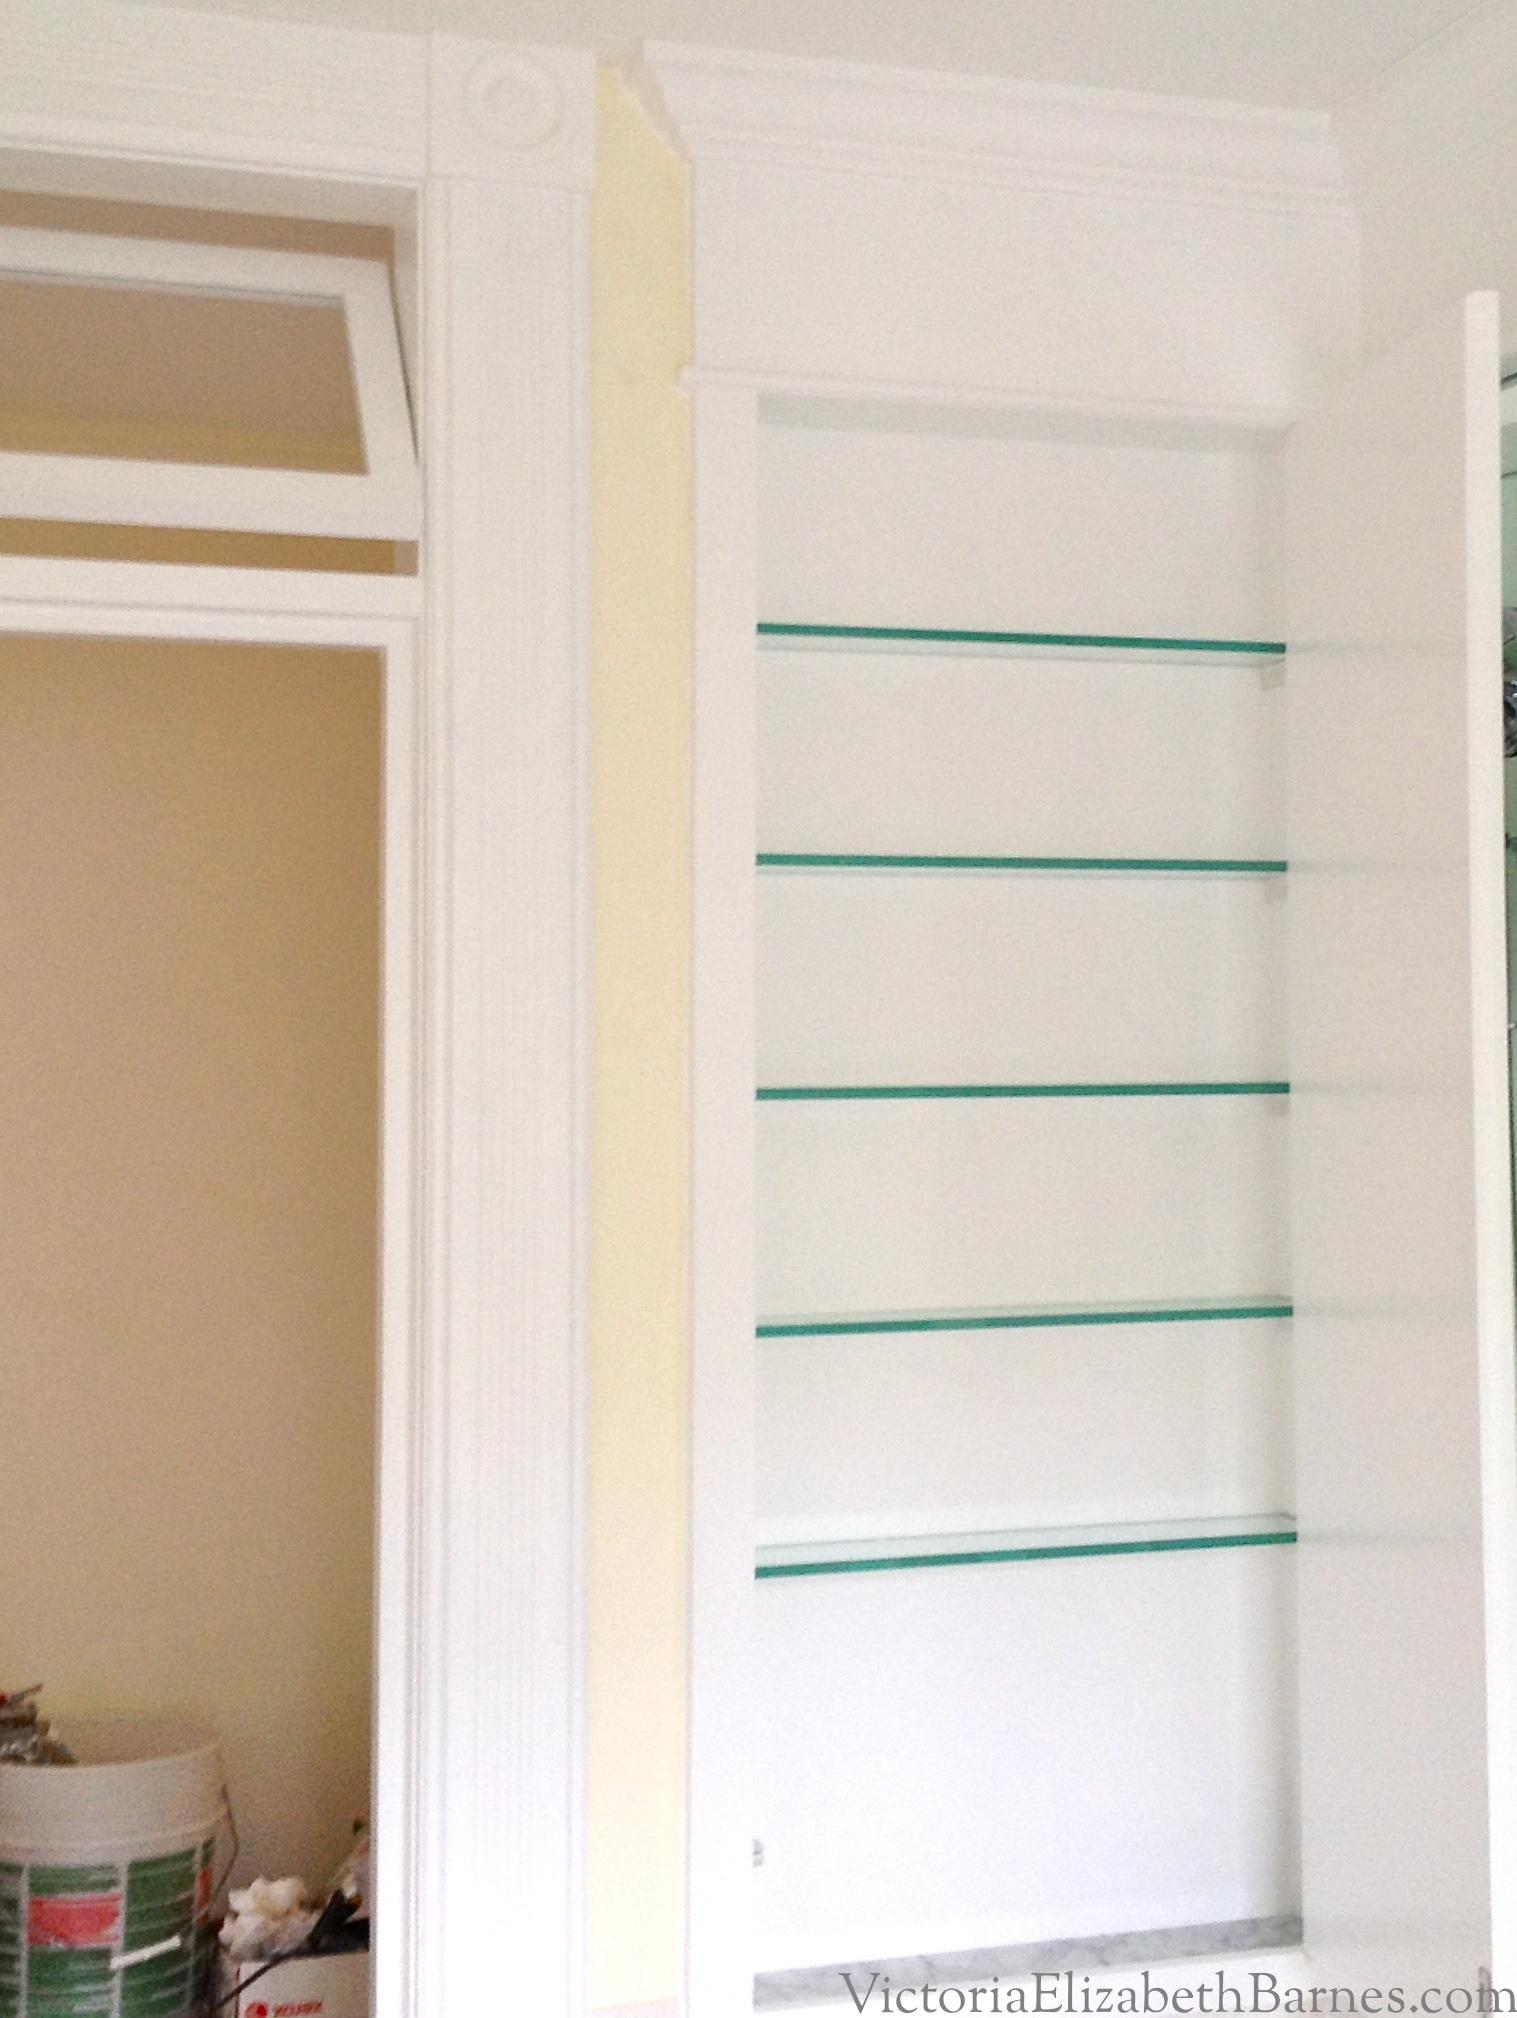 Furniture Bathroom Interior Kitchen Cabinet Design Diy Custom Design Built  Decorative Medicine Cabinet A Tall Mirrored